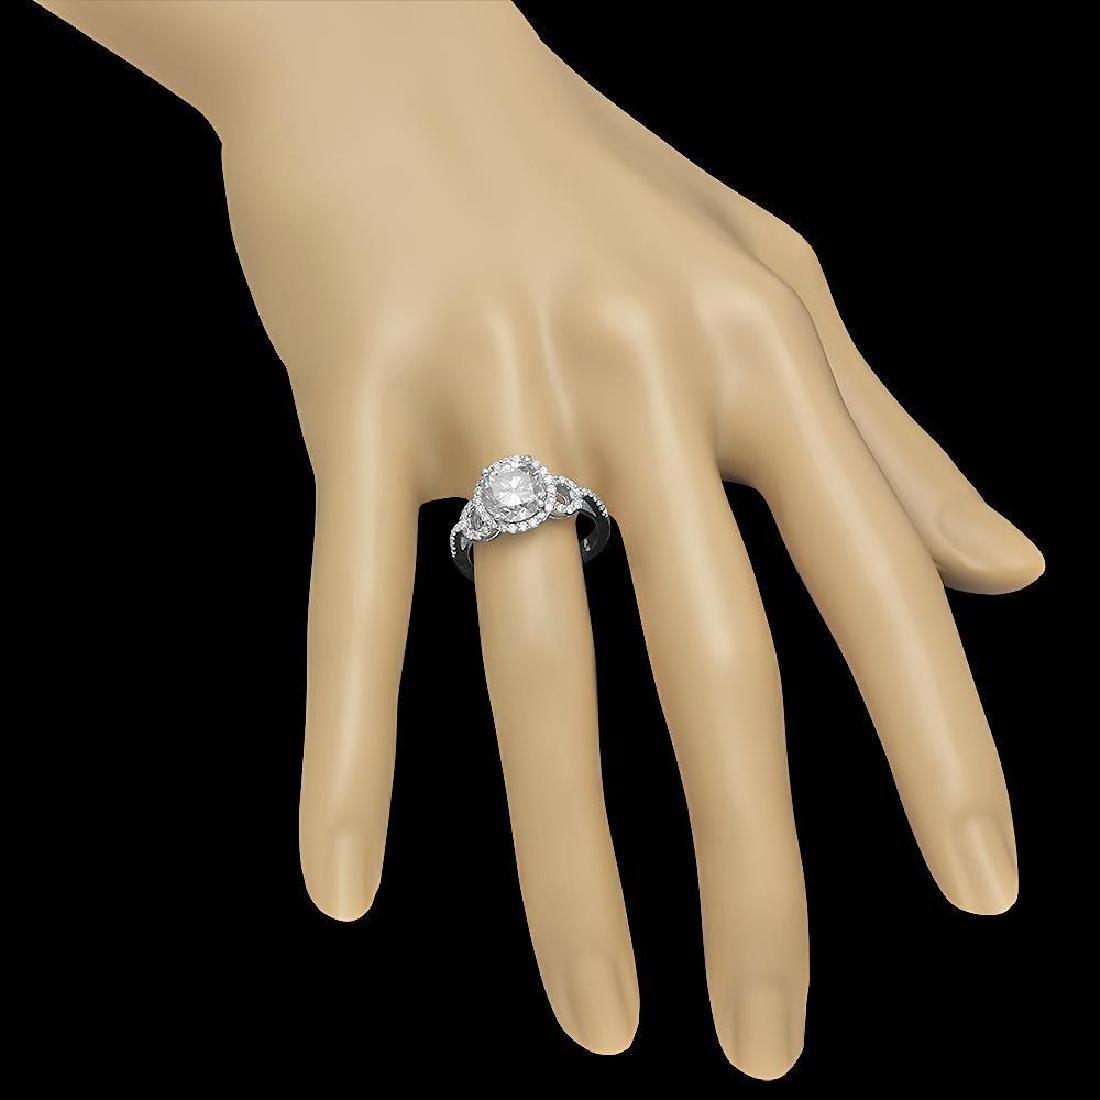 14K Gold 2.73ct Diamond Ring - 3